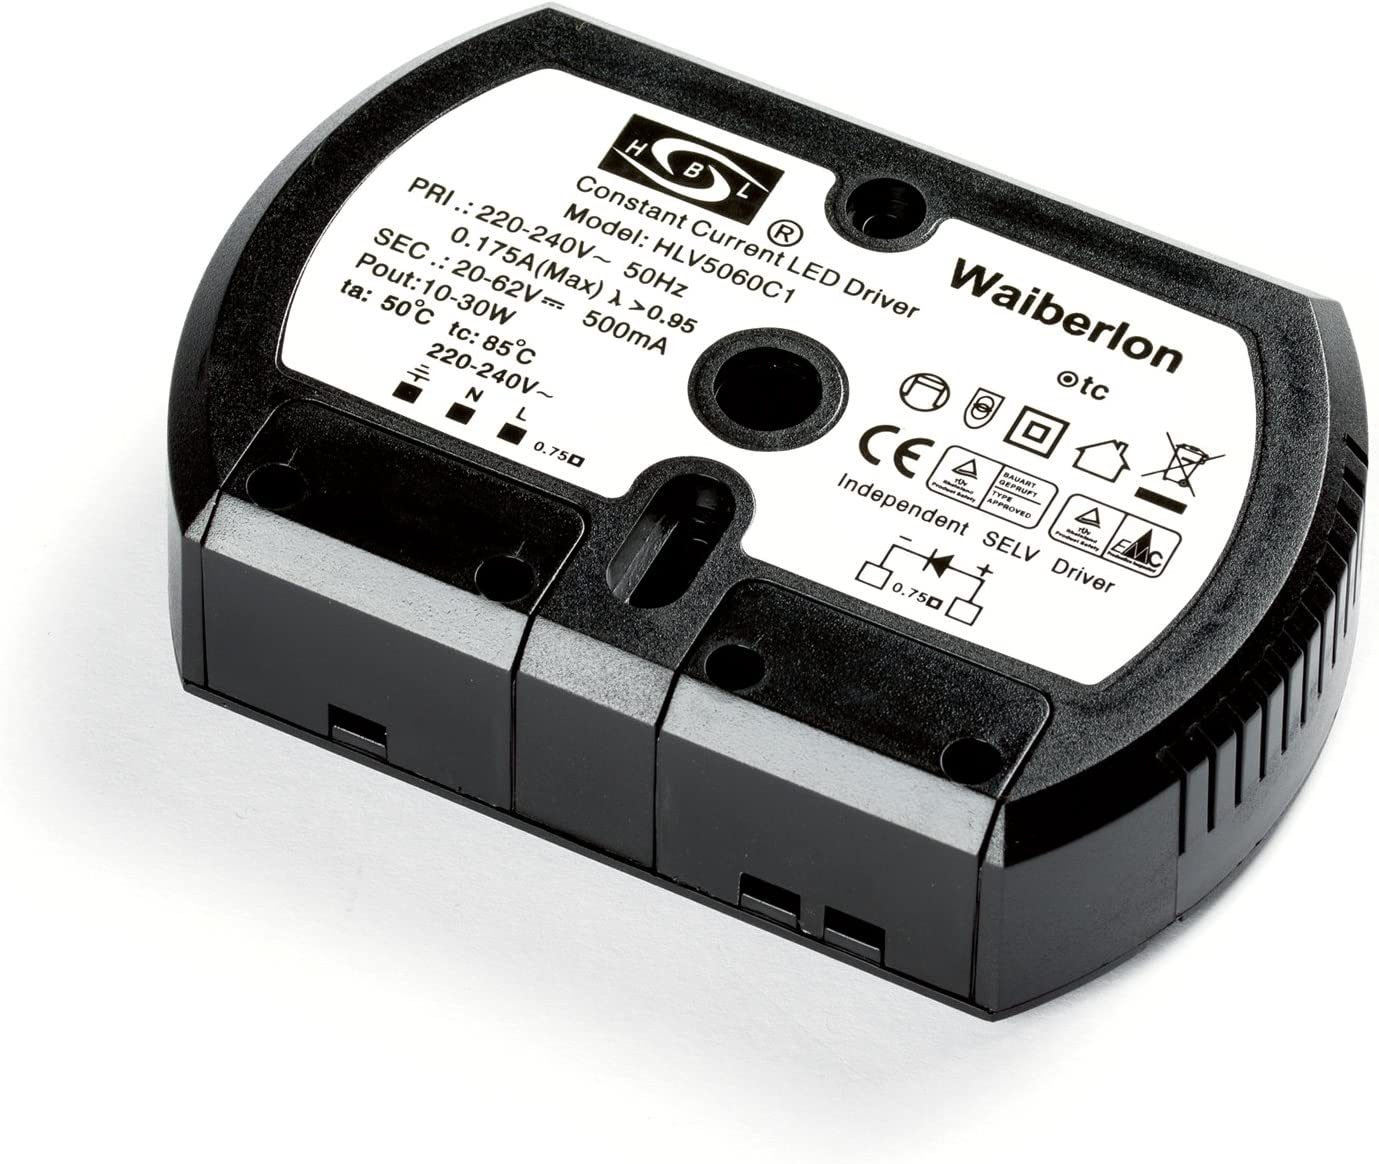 Waiberlon hBL transformateur lED driver current hLV5060C1 10 62 v 500 mA 30W 20